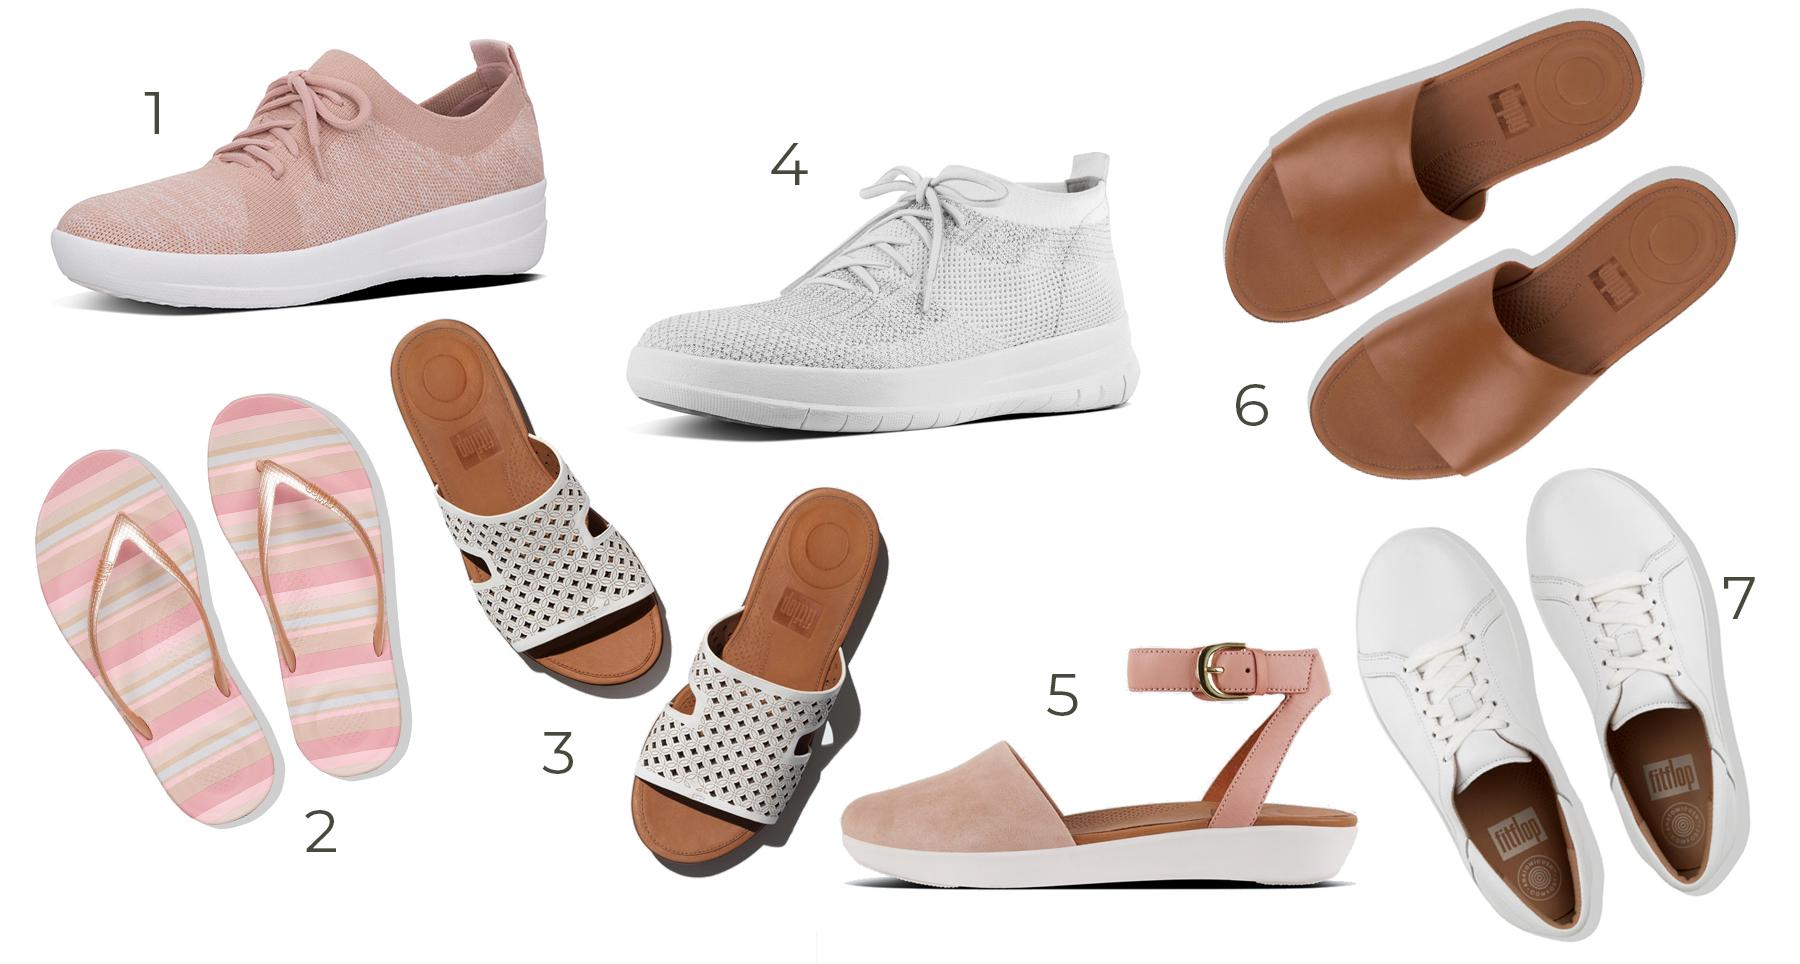 Fitflop favorites, comfortable ergonomic shoes